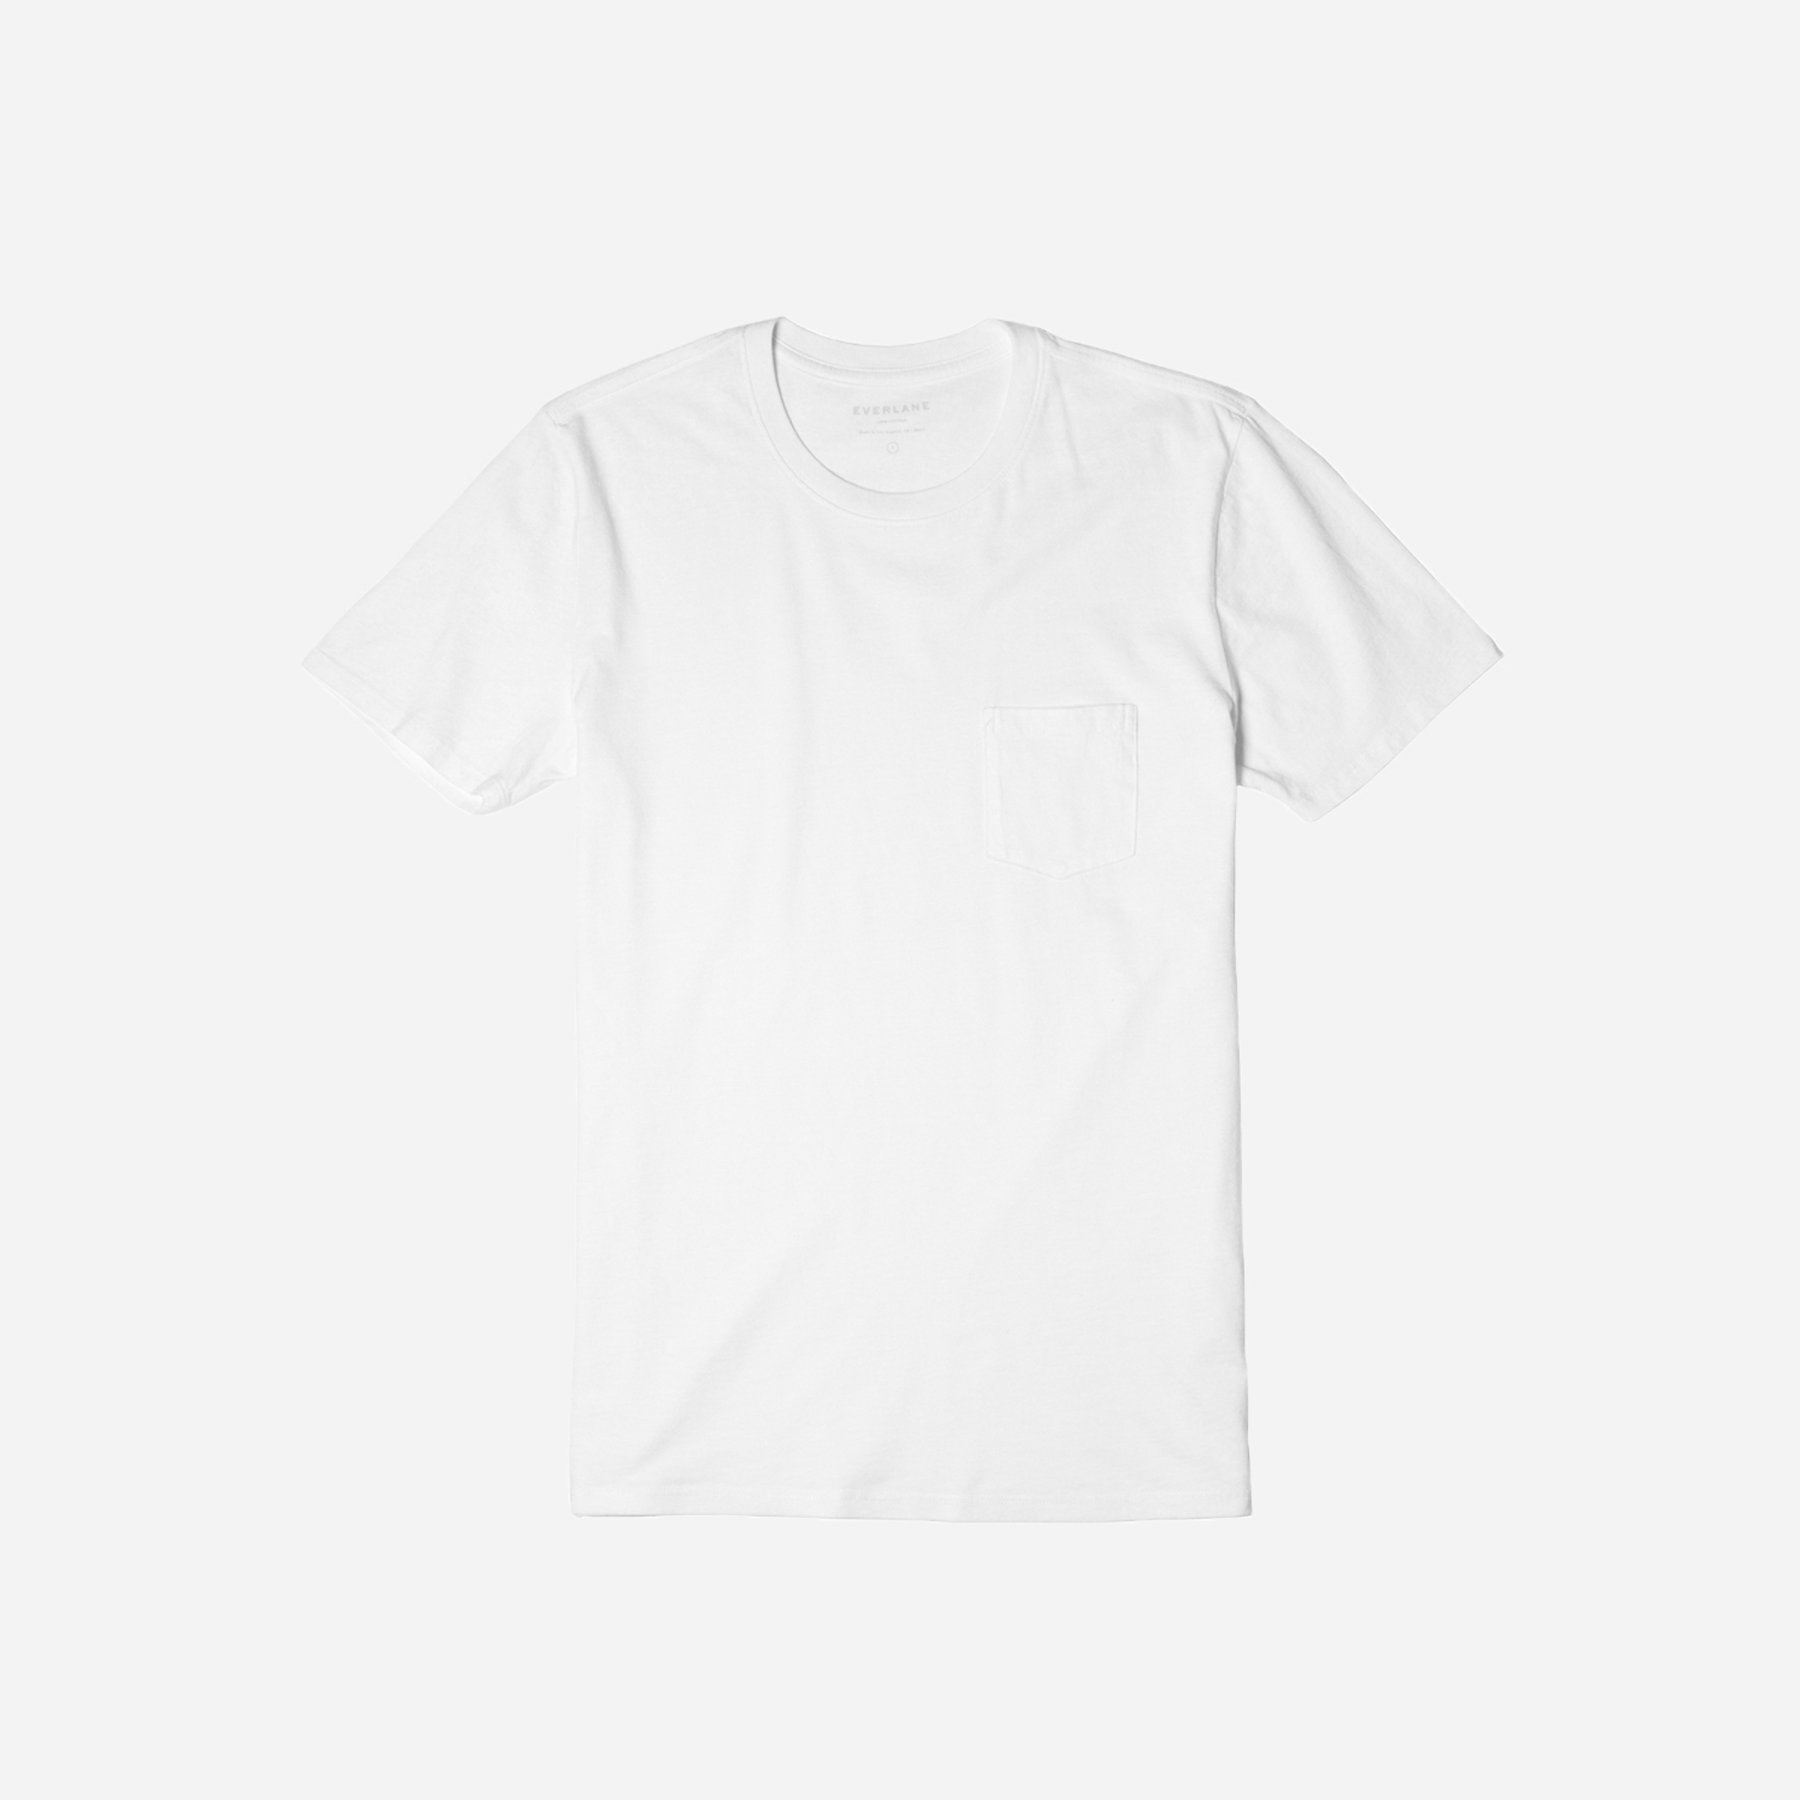 Everlane Men's Cotton Pocket T-Shirt